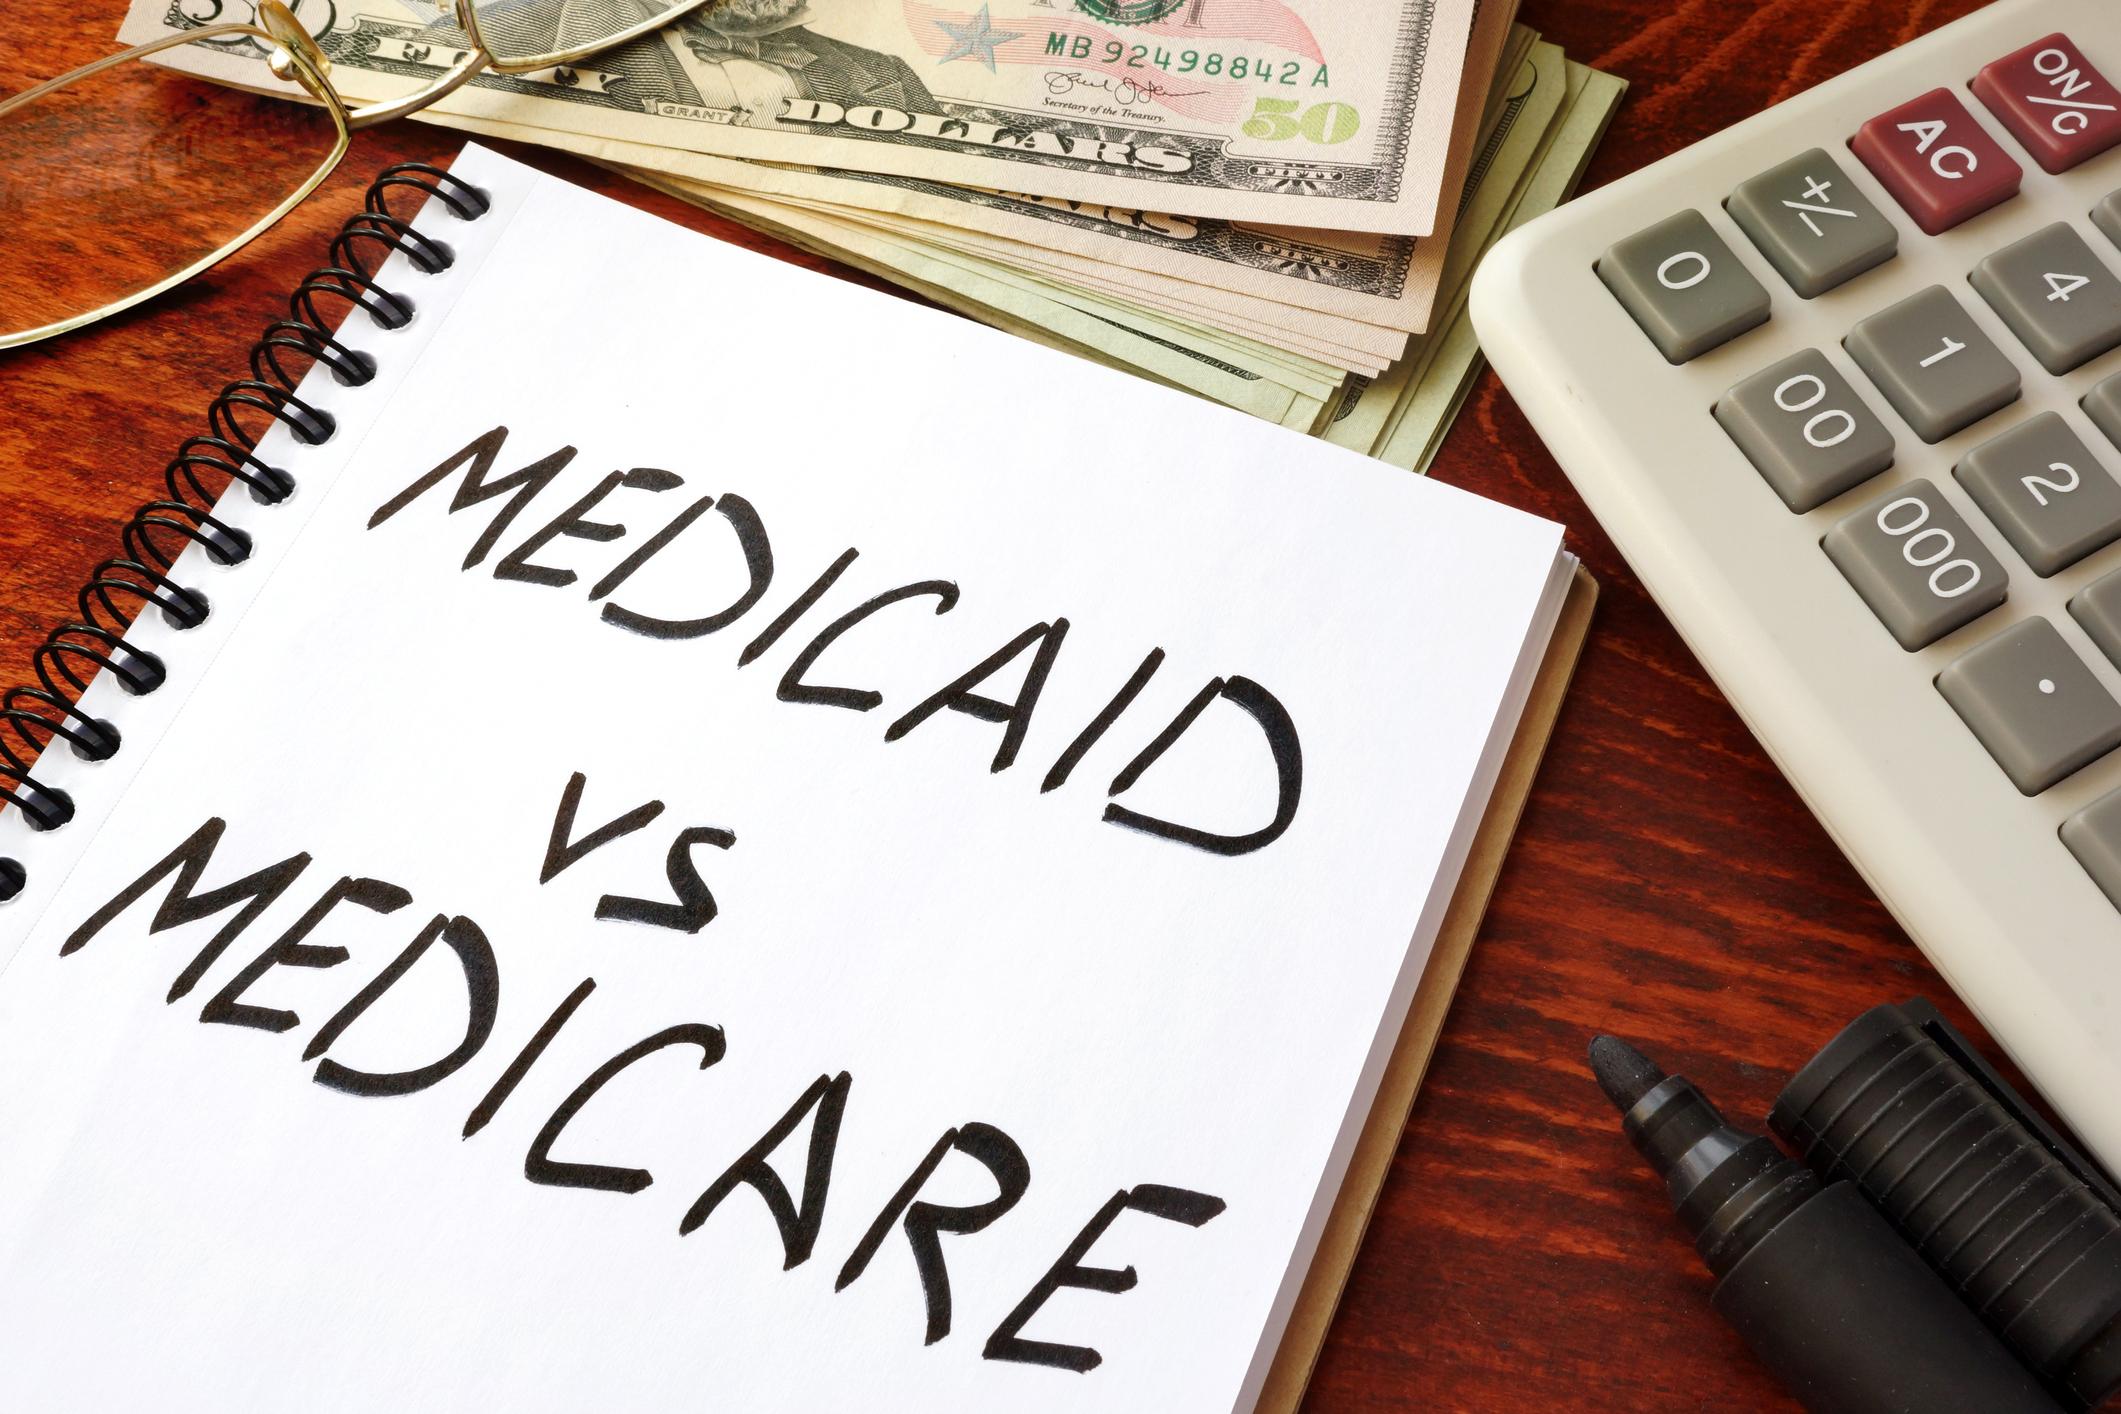 Medicaid vs. Medicare on a notepad